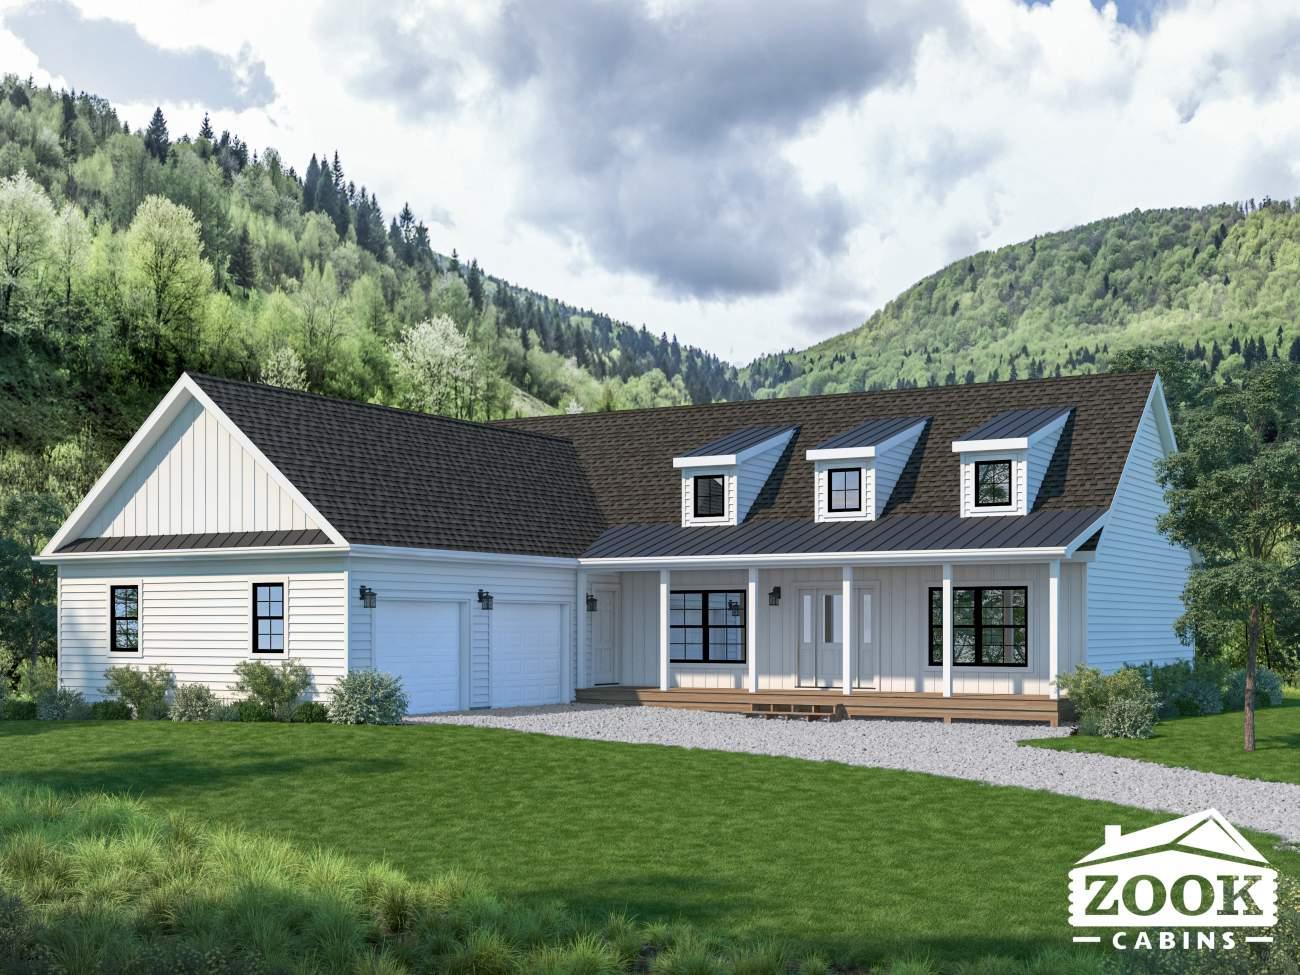 Homestead Modern Cabin Zook Cabins